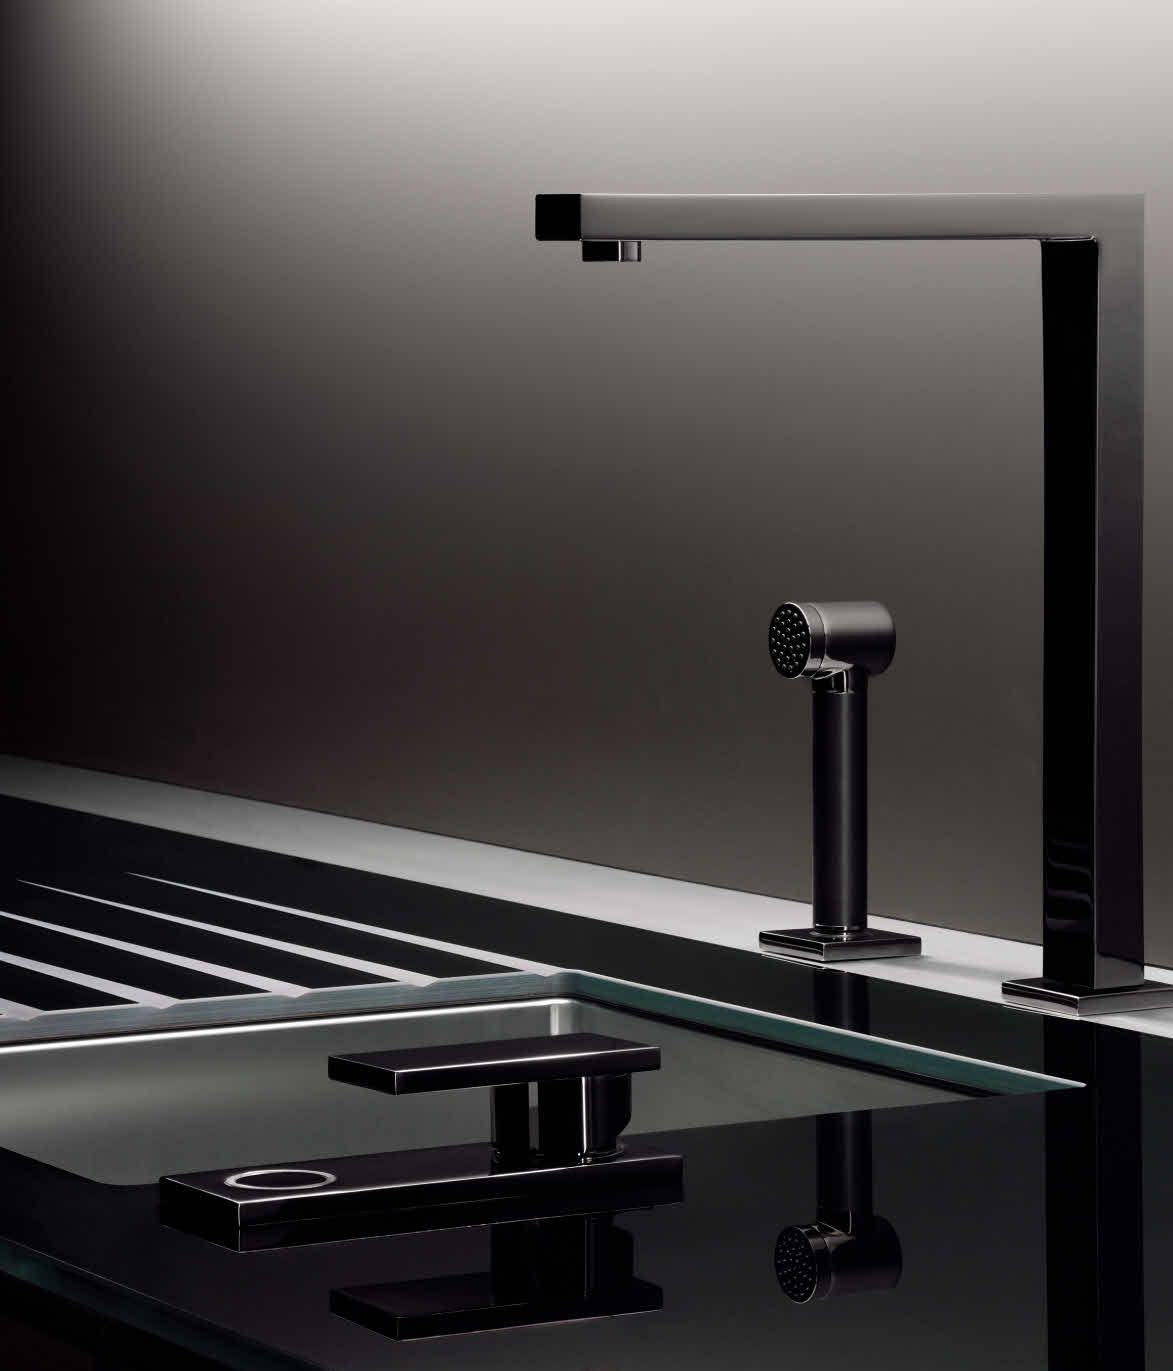 Porsche Design Kitchen Appliances: Porsche Design In Collaboration With Poggenpohl